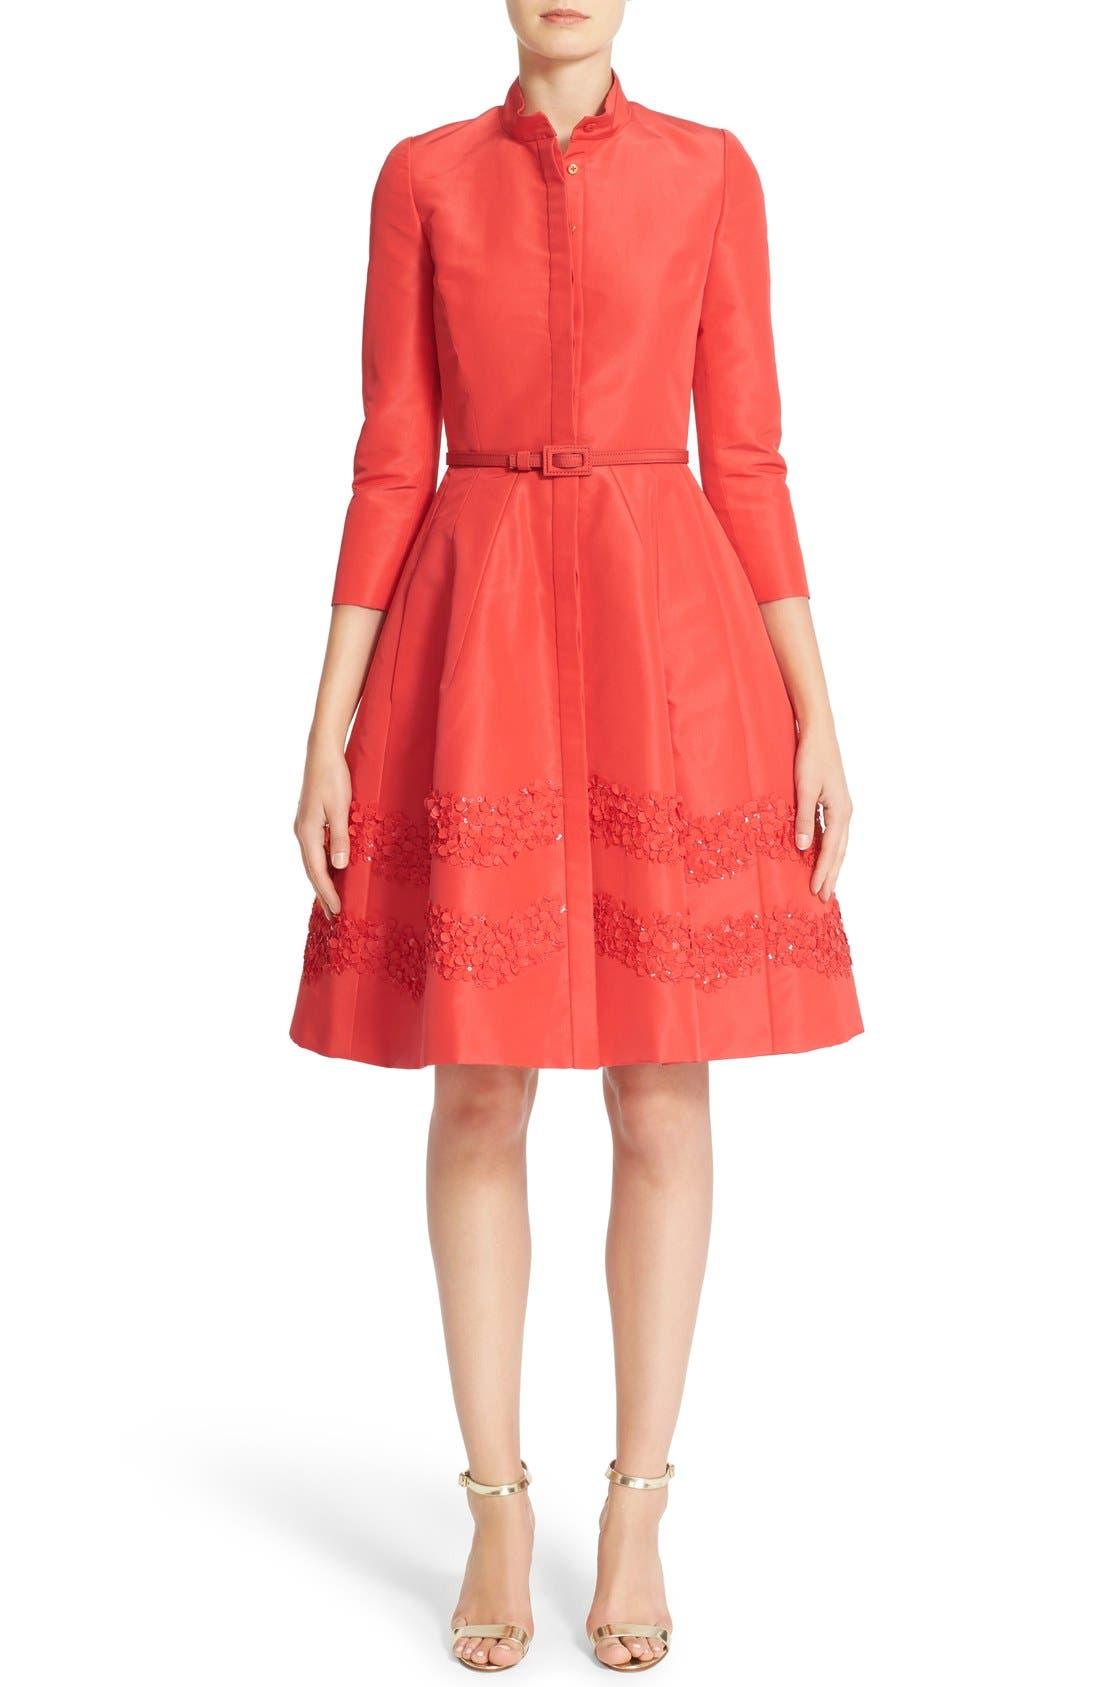 Alternate Image 1 Selected - Carolina Herrera Embellished Belted Silk Faille A-Line Shirtdress